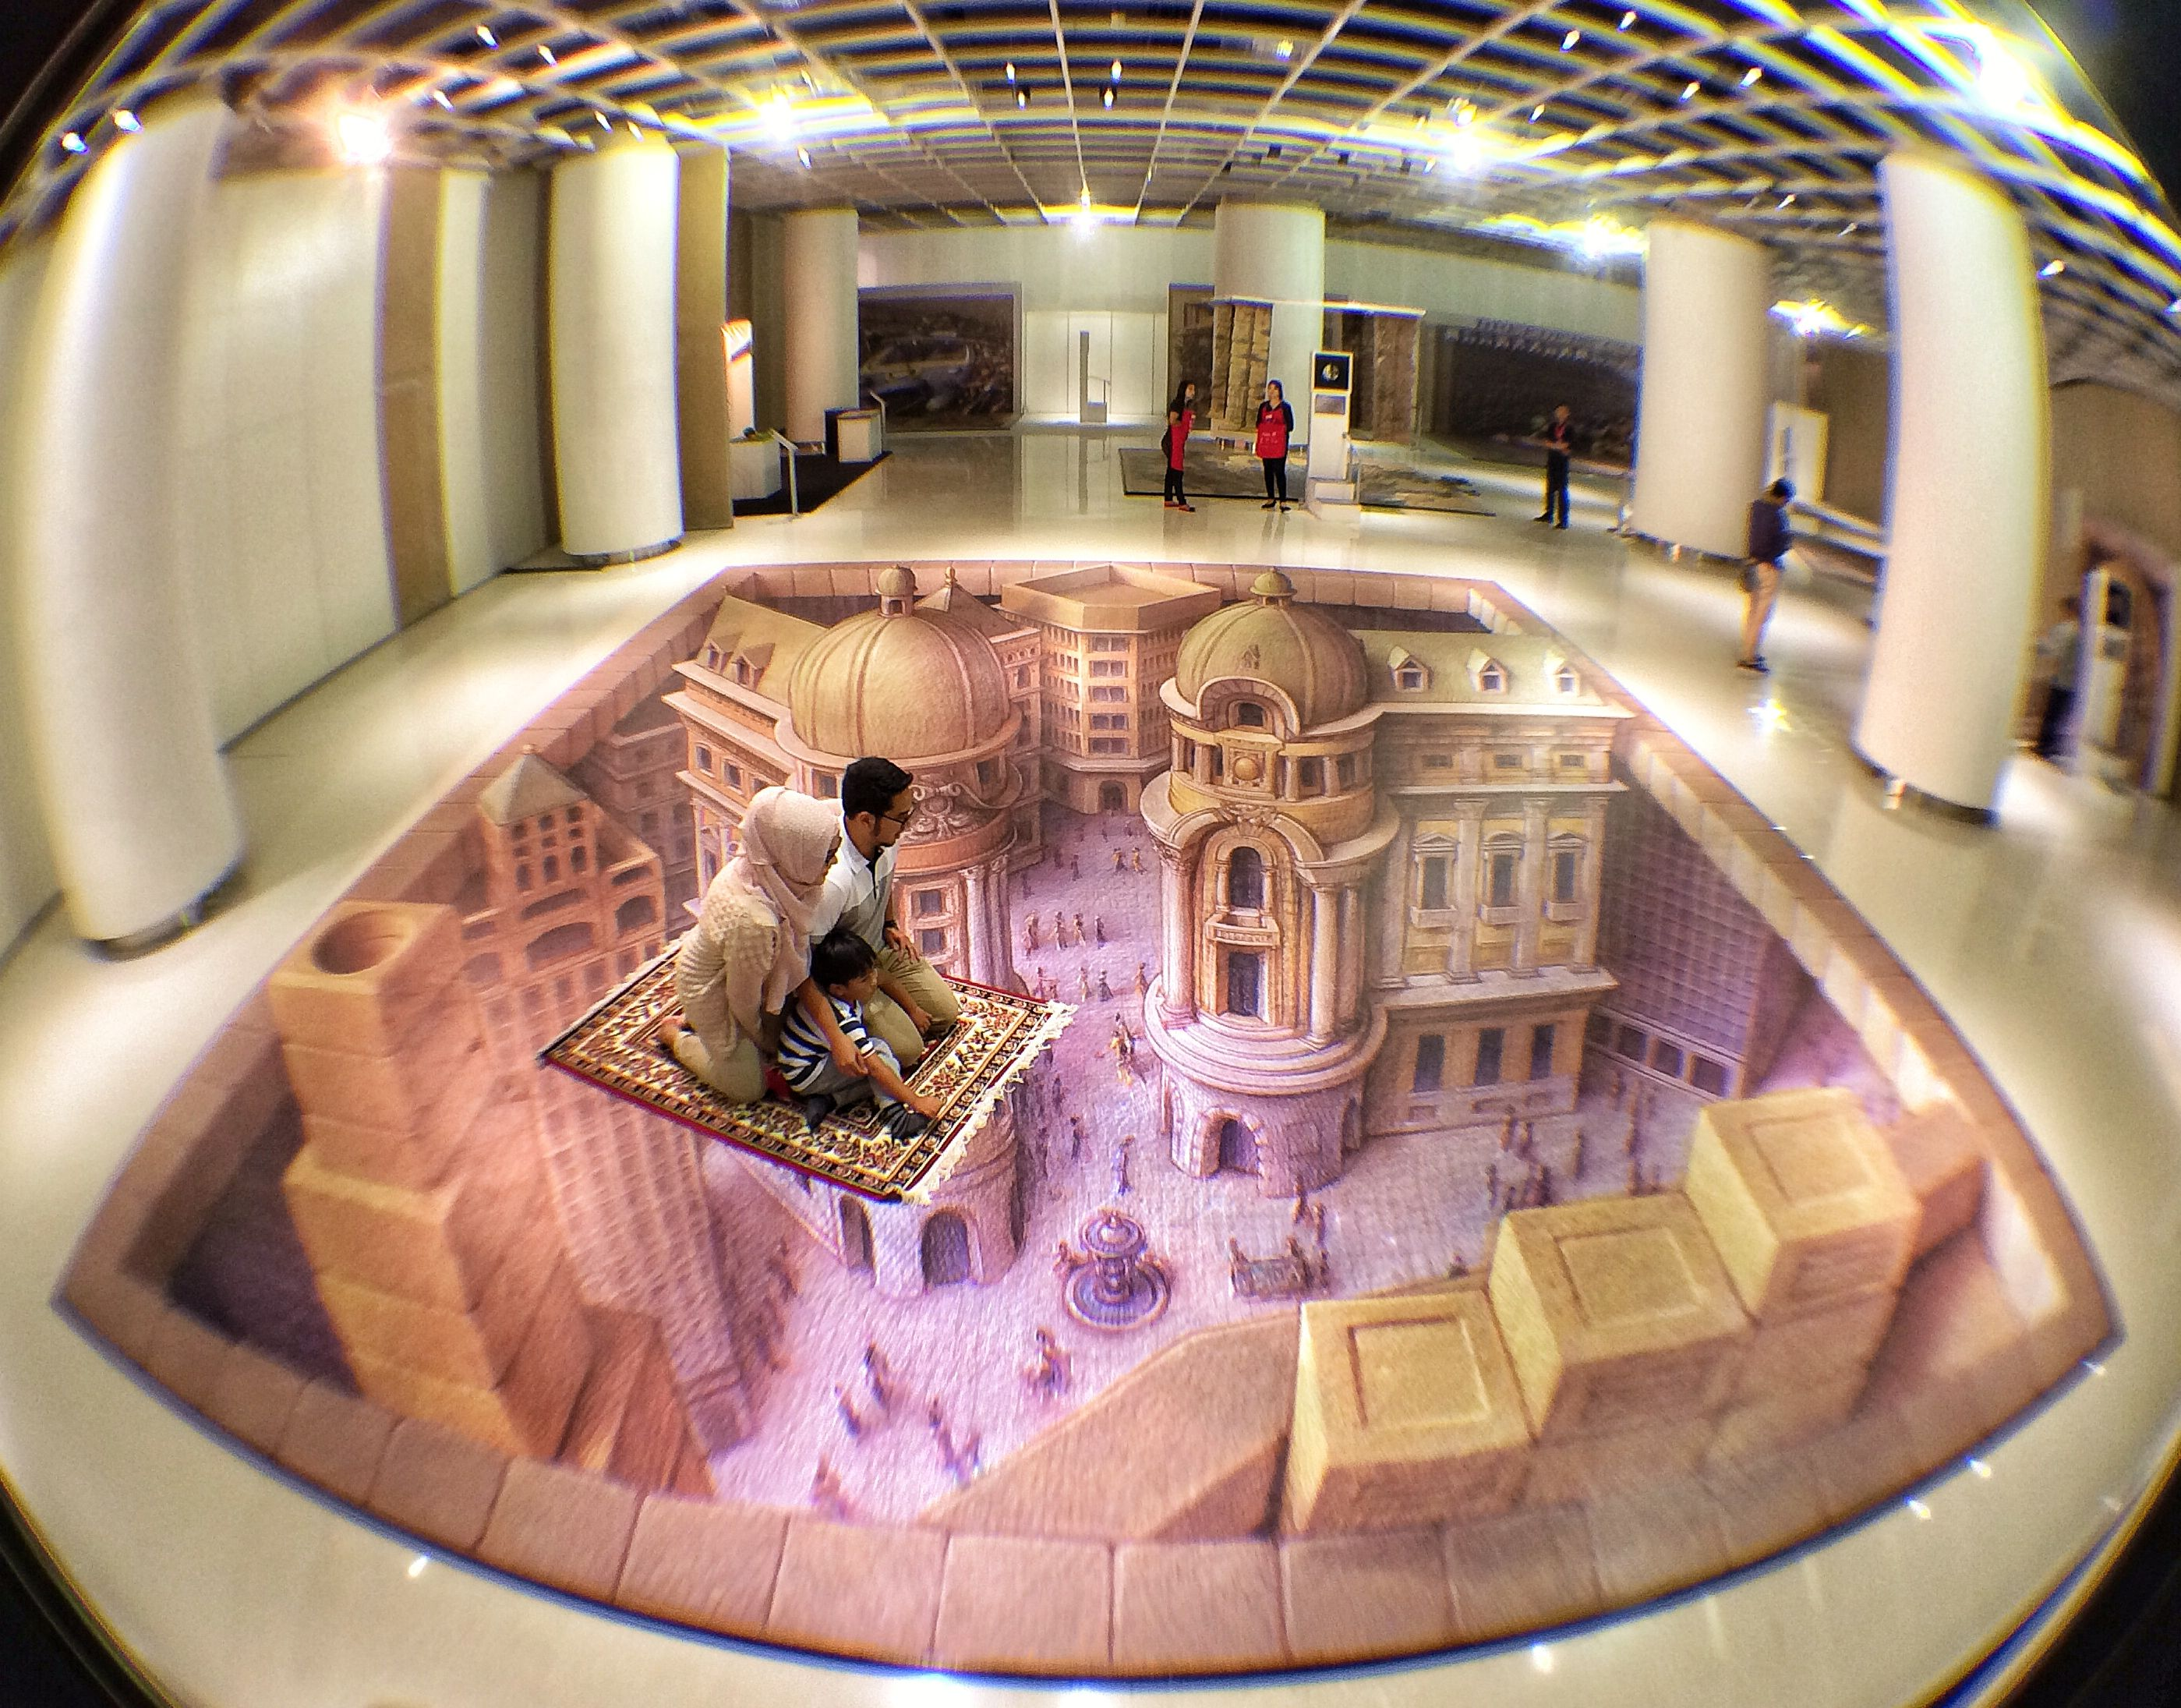 Empire - Kurt Wenner Exhibition at Cipuatra Artpreneur